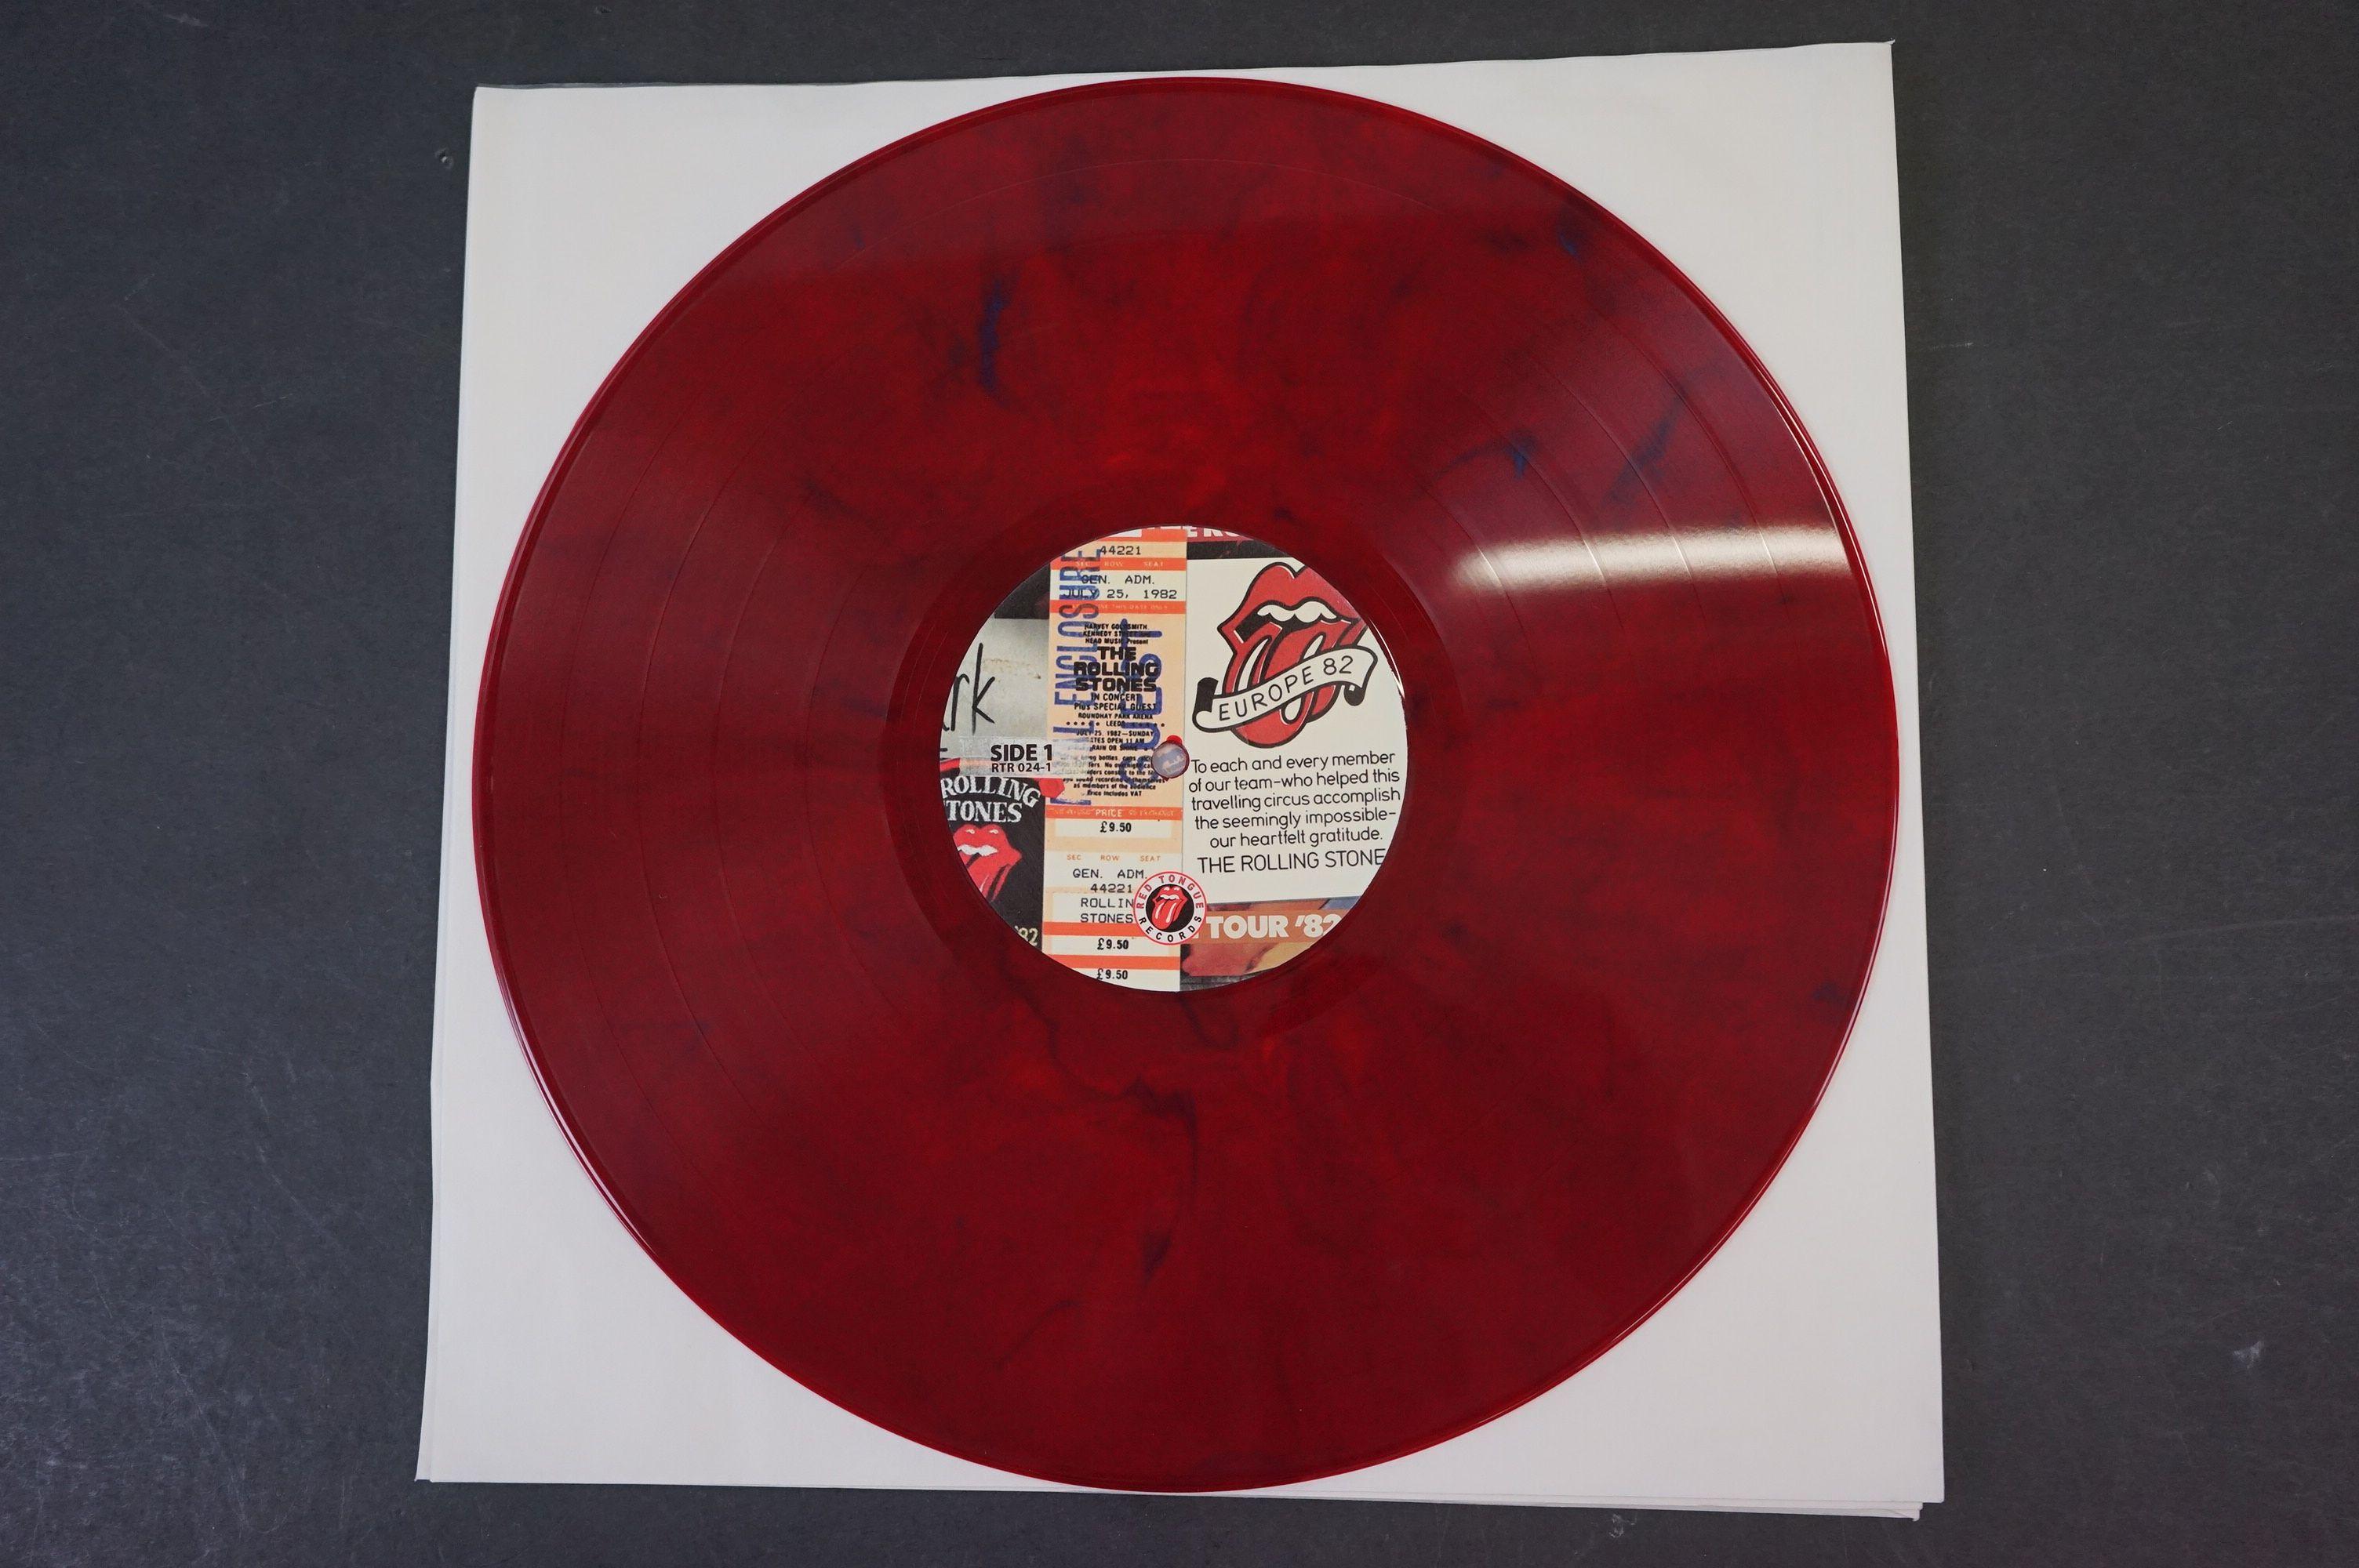 Vinyl - ltd edn The Real Alternate Album Rolling Stones Leeds July 25 1982 3 LP / 2 CD Box Set RTR - Image 5 of 10